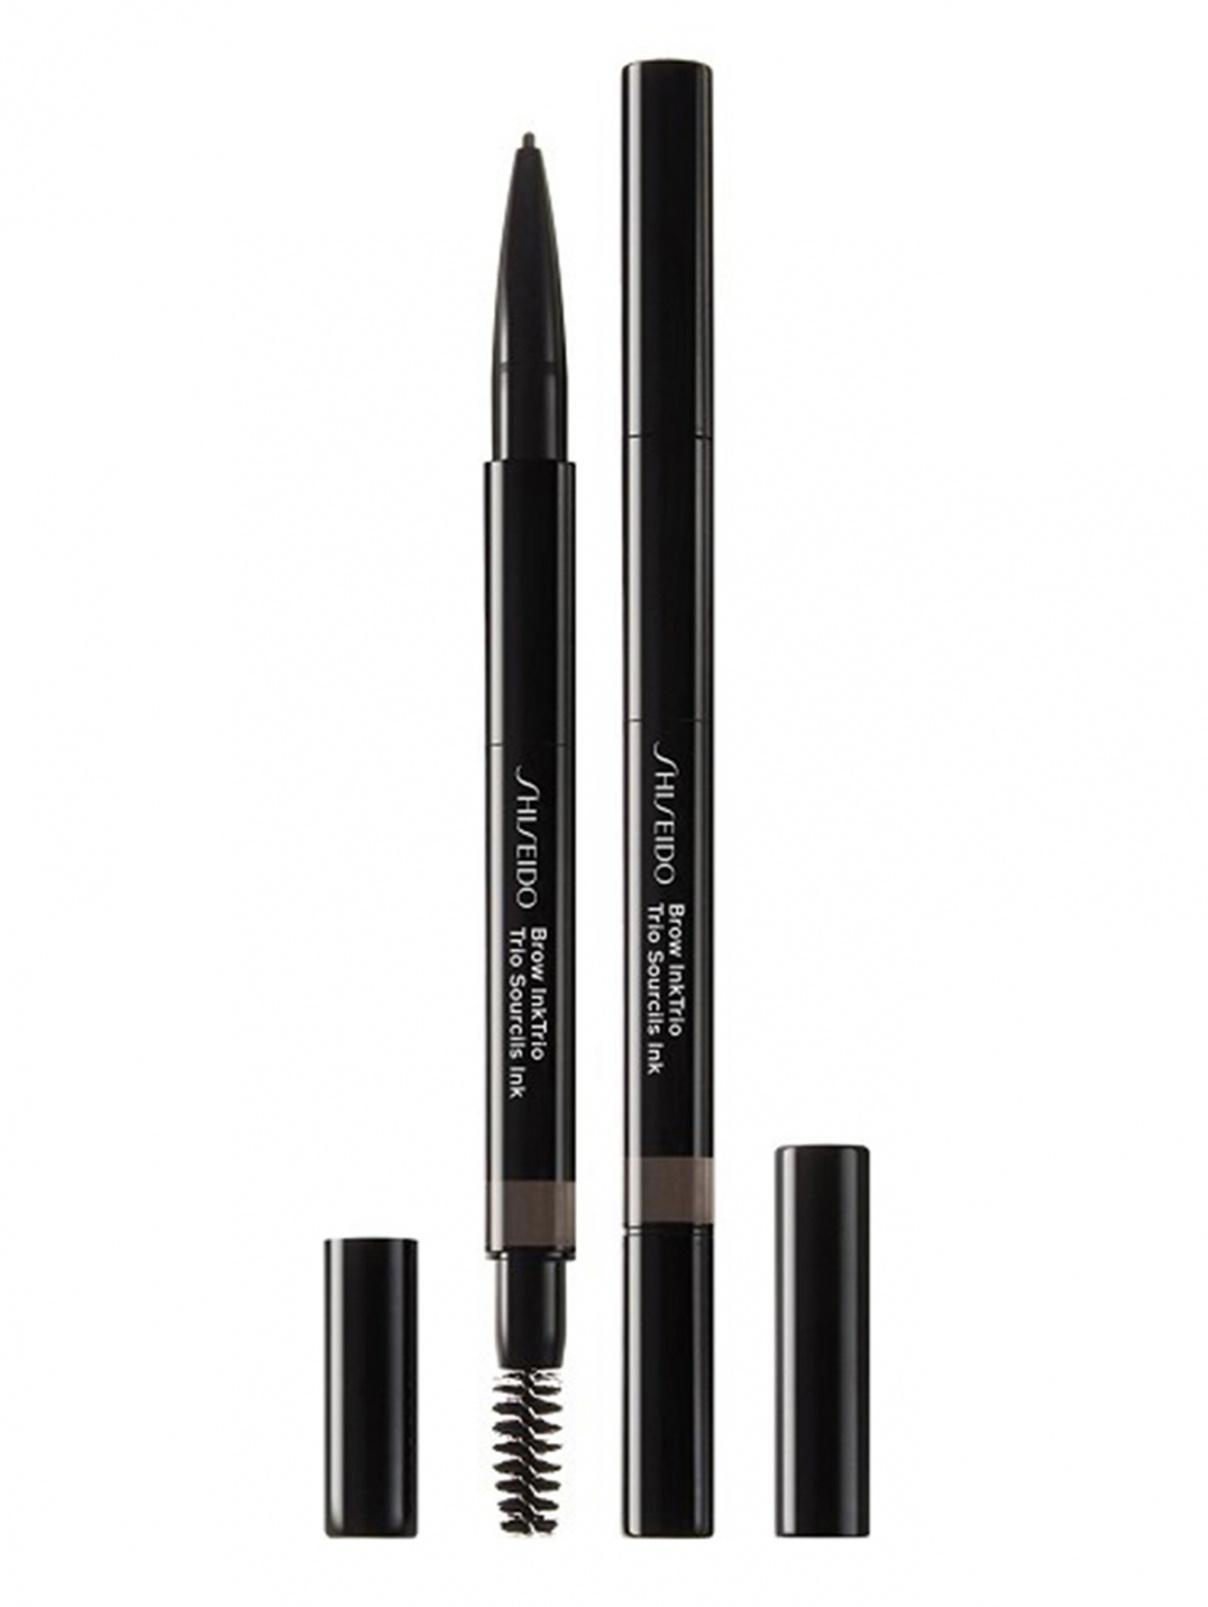 SHISEIDO Моделирующий карандаш для бровей 3-в-1 InkTrio, 03 DEEP BROWN, 0.25 г Shiseido  –  Общий вид